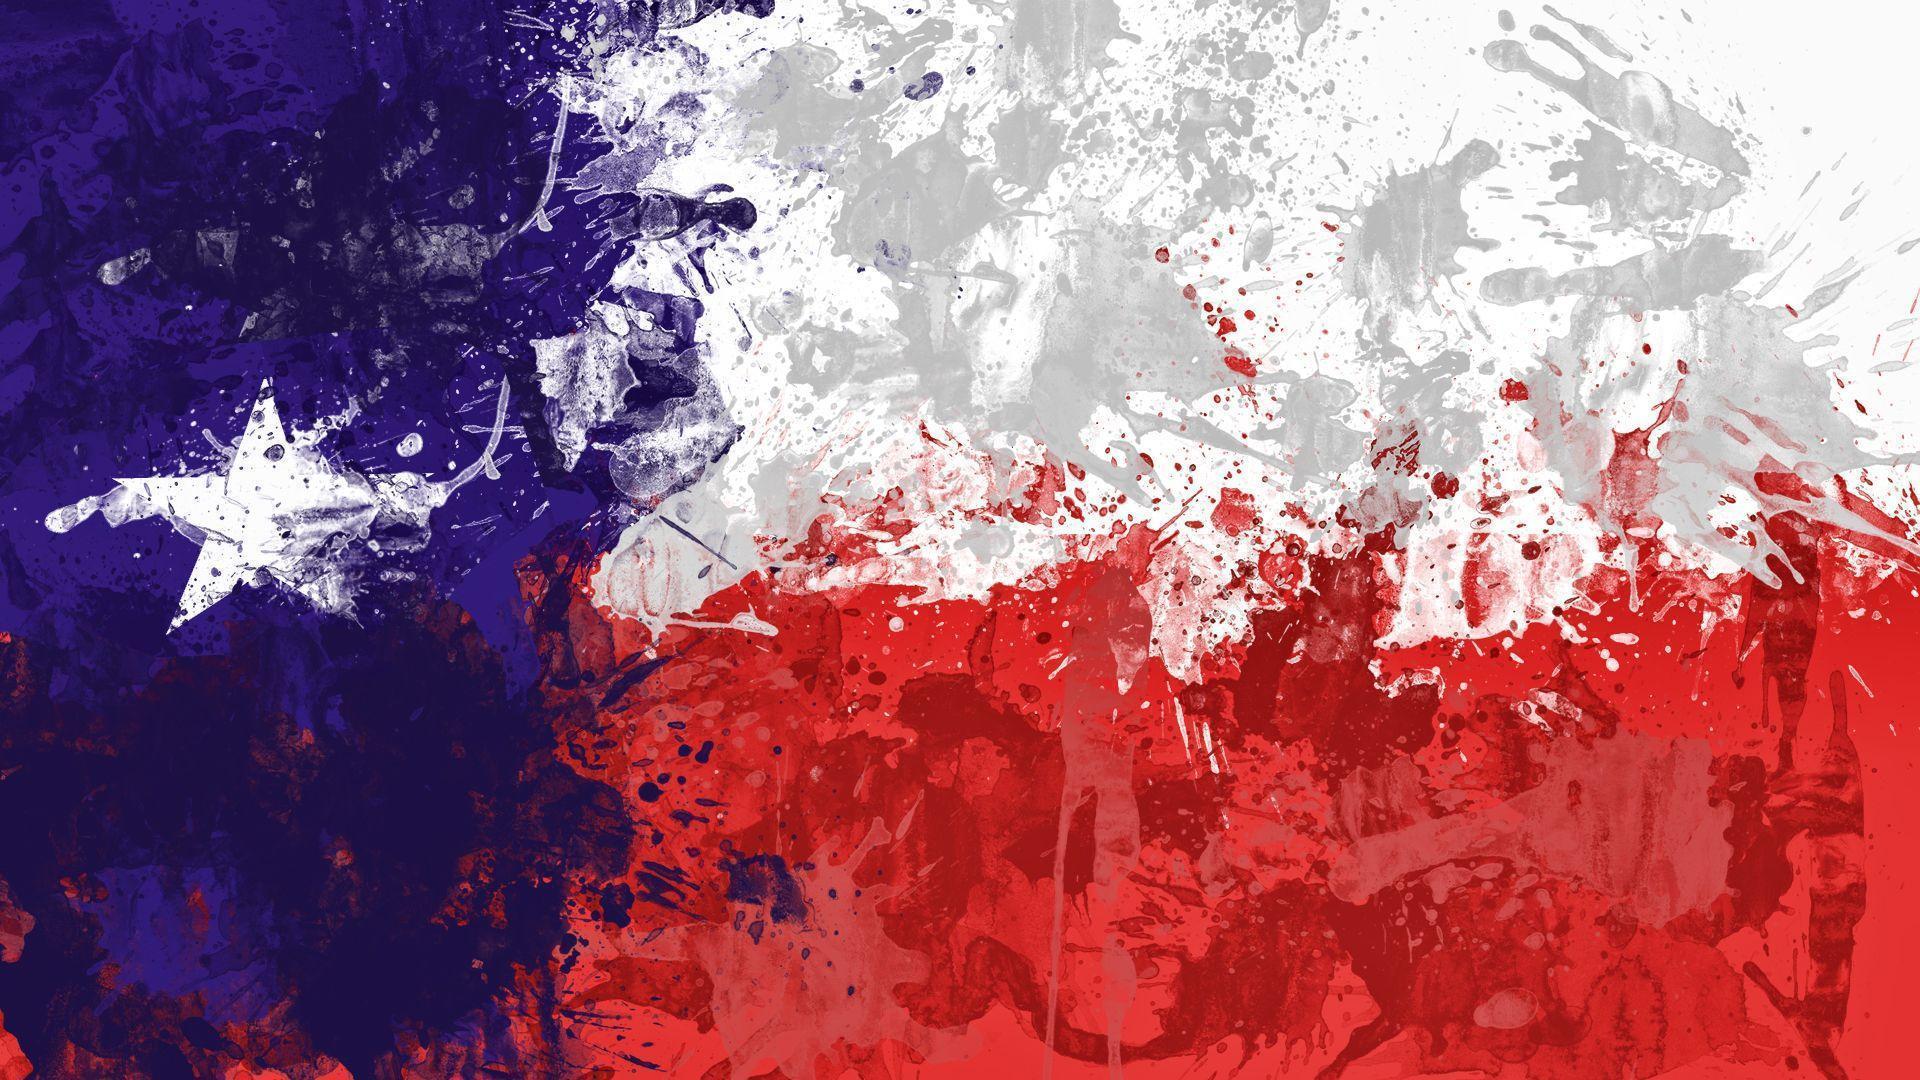 Texas Wallpapers Texas Backgrounds TrumpWallpapers 1920x1080